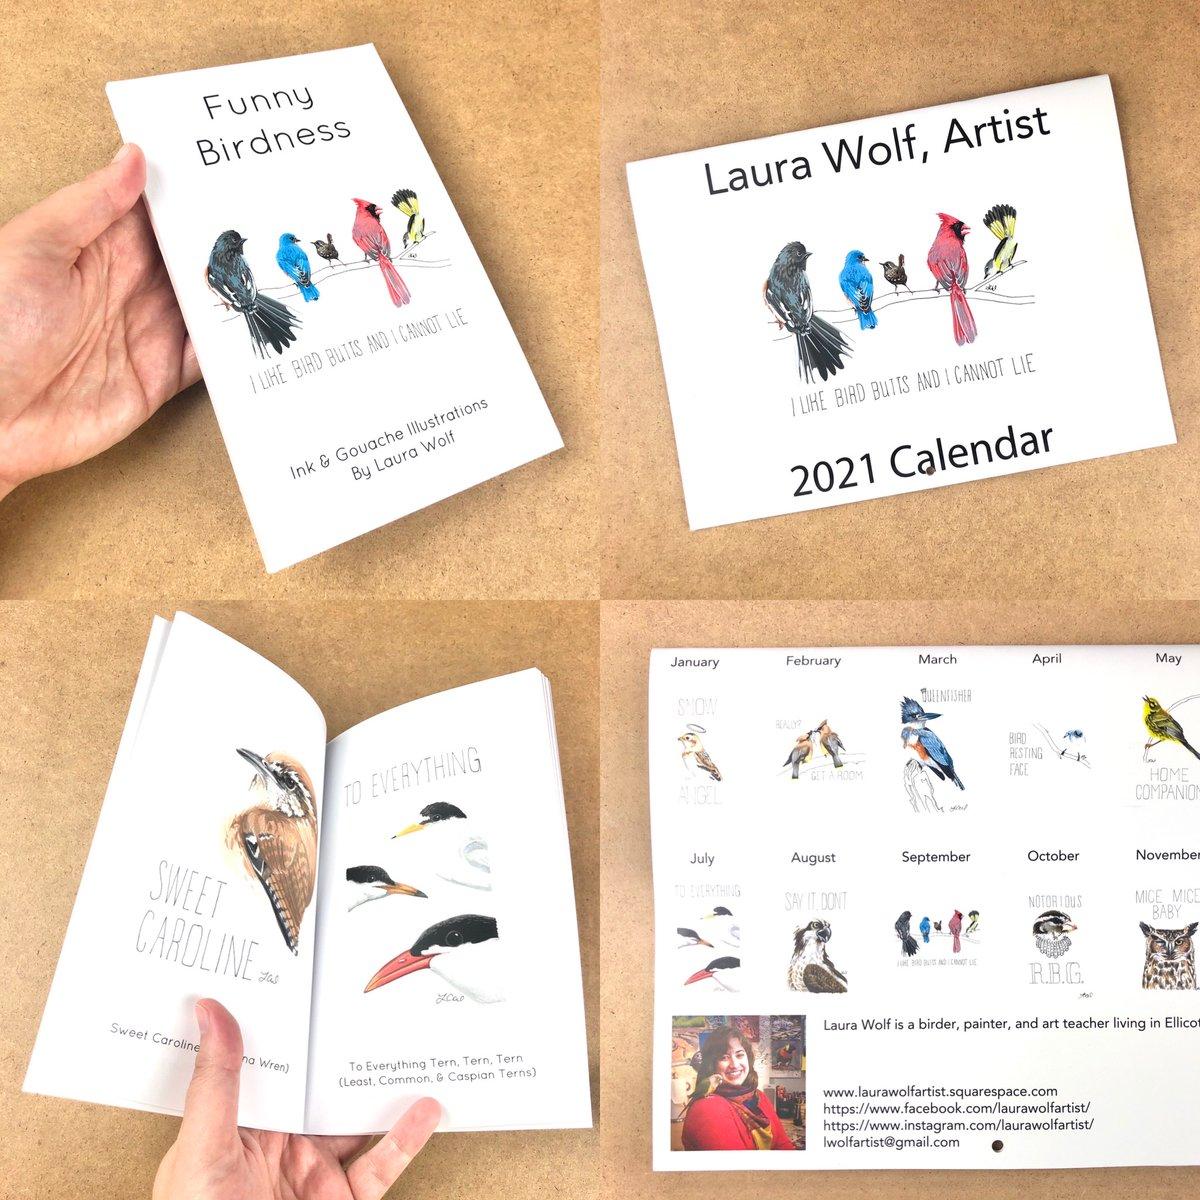 2021 #calendars and my very own #book are good to go! Link in profile! #birds #birding #birdwatching #bird #painting #gouache #ink #illustration #localartist #funnybirdness #puns #humor #featheredfriends #papergoods #gifts #natureart #wildlifeart #nature #wildlife #animalspic.twitter.com/brws0xADKA